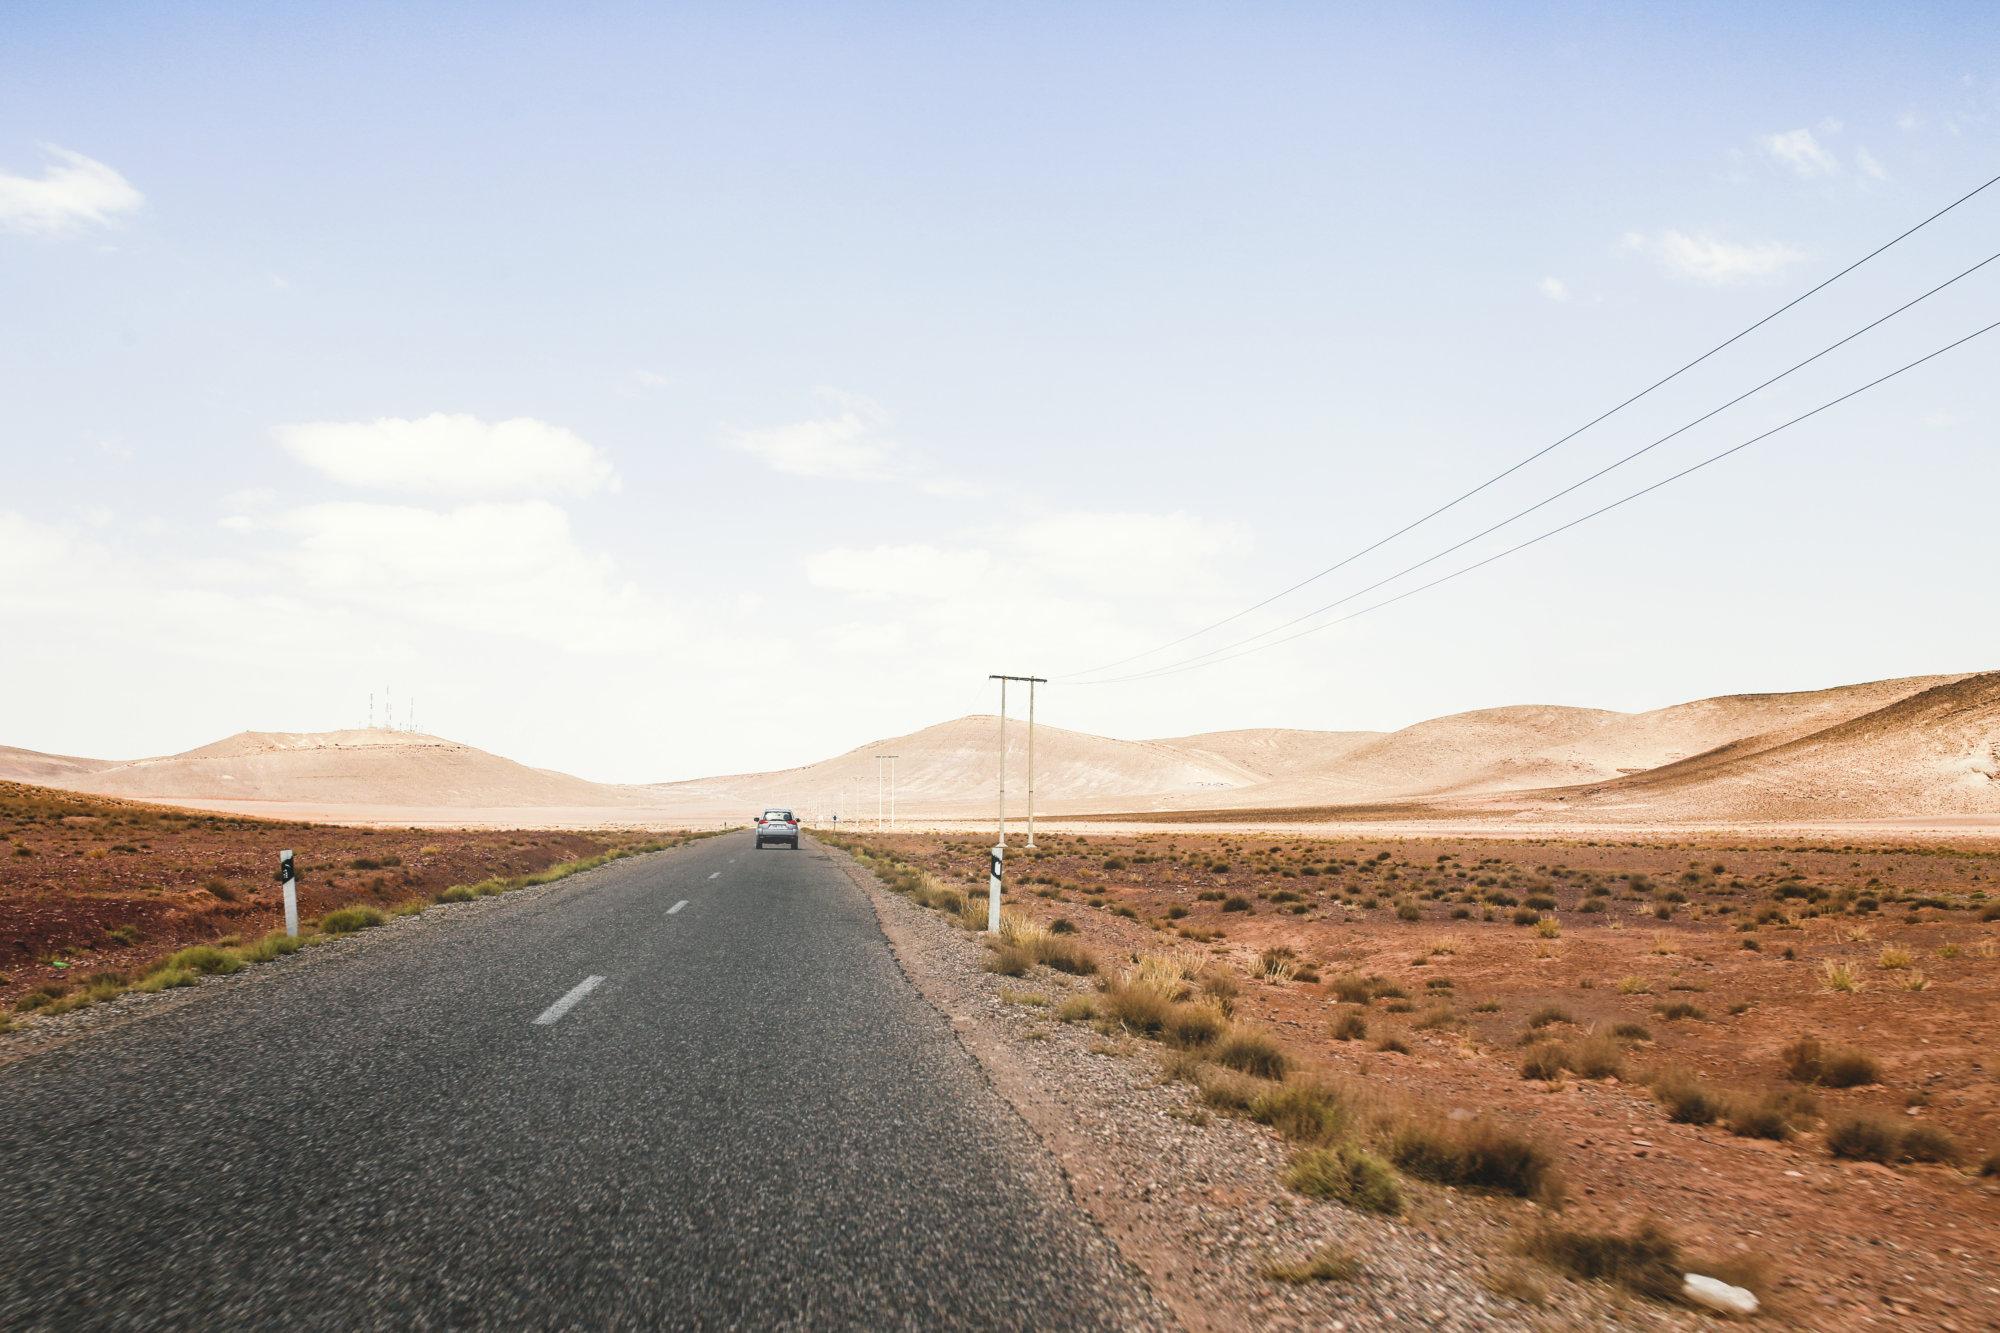 irgendwo-im-nirgendwo-on-the-road-marokko-2016-mcu-ausflug